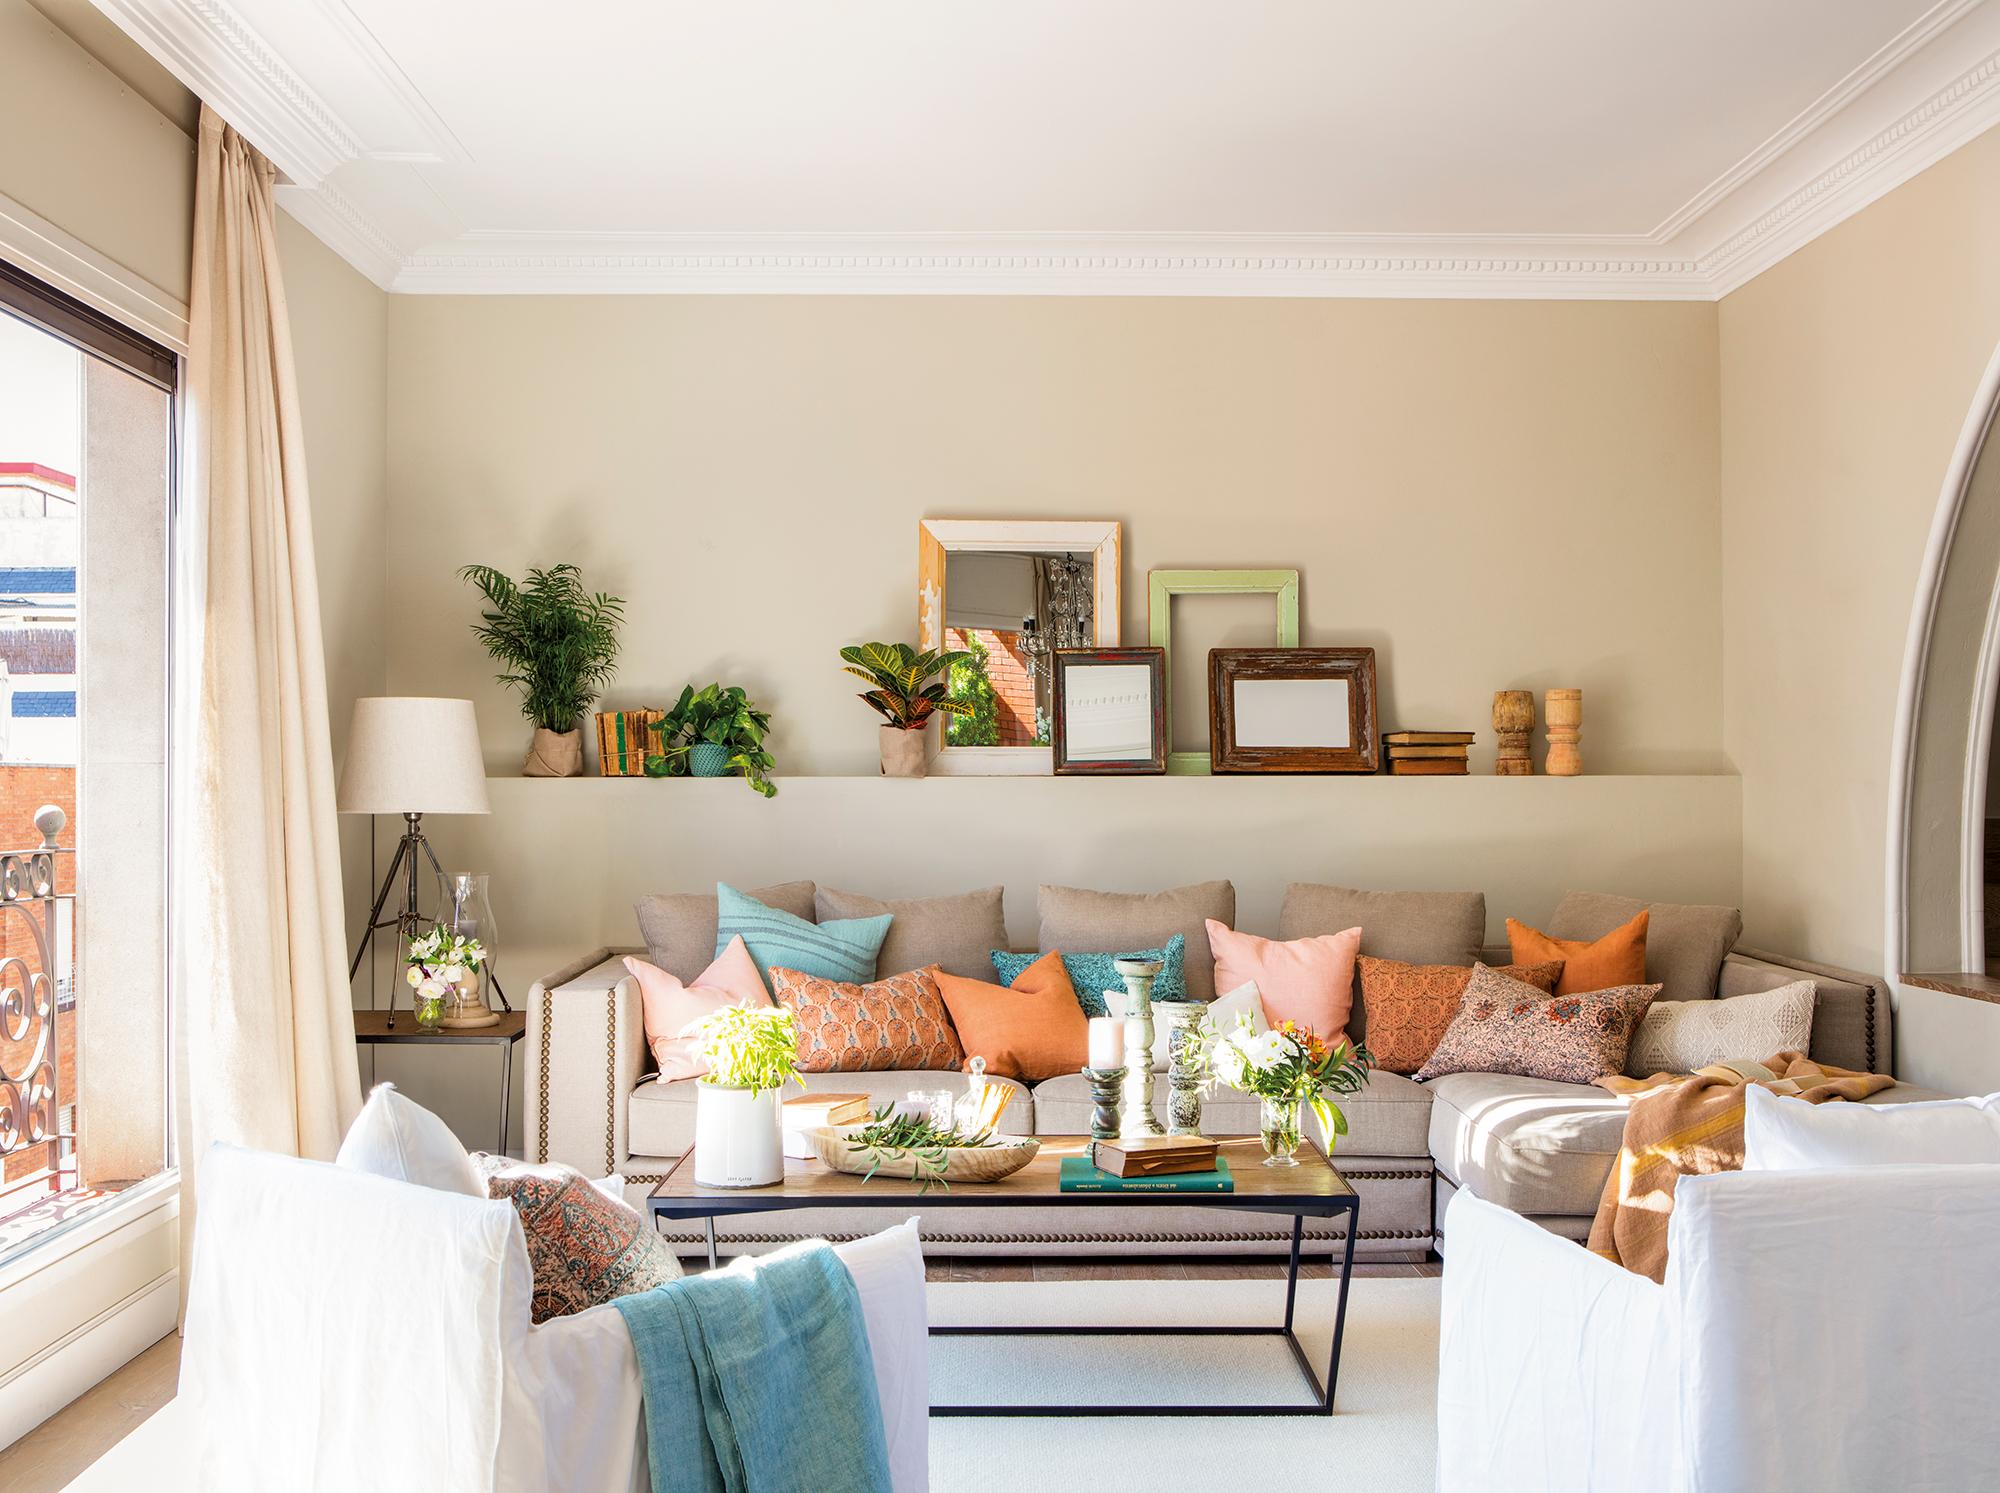 Sof claves para elegirlo - Ideas para decorar salones pequenos ...